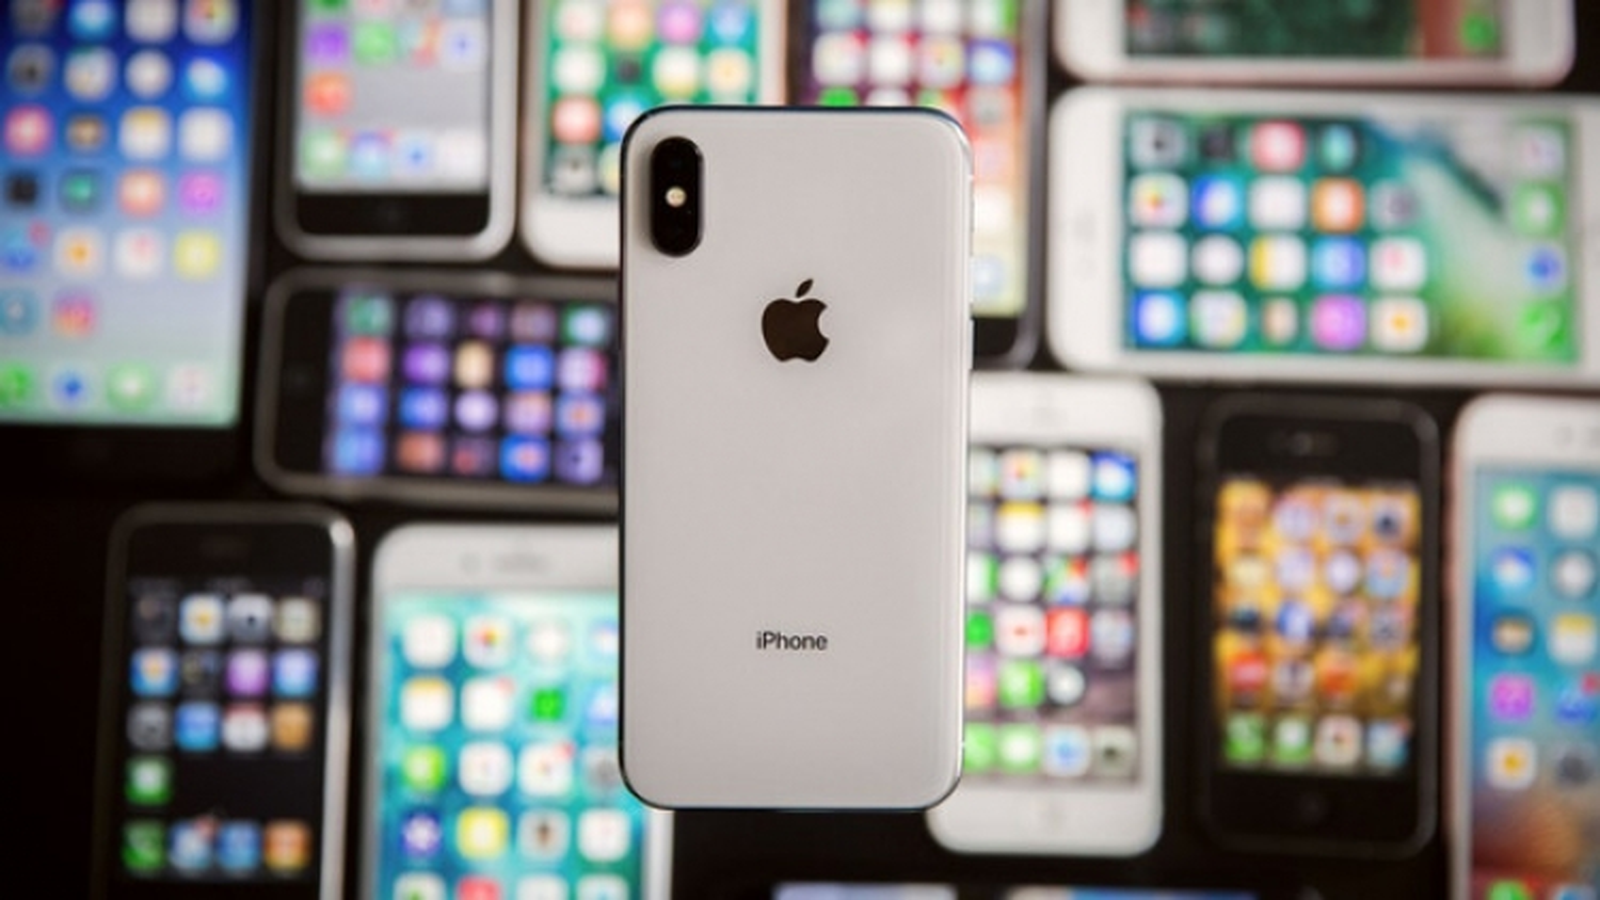 iPhone X orders weak globally, but strong in Vietnam